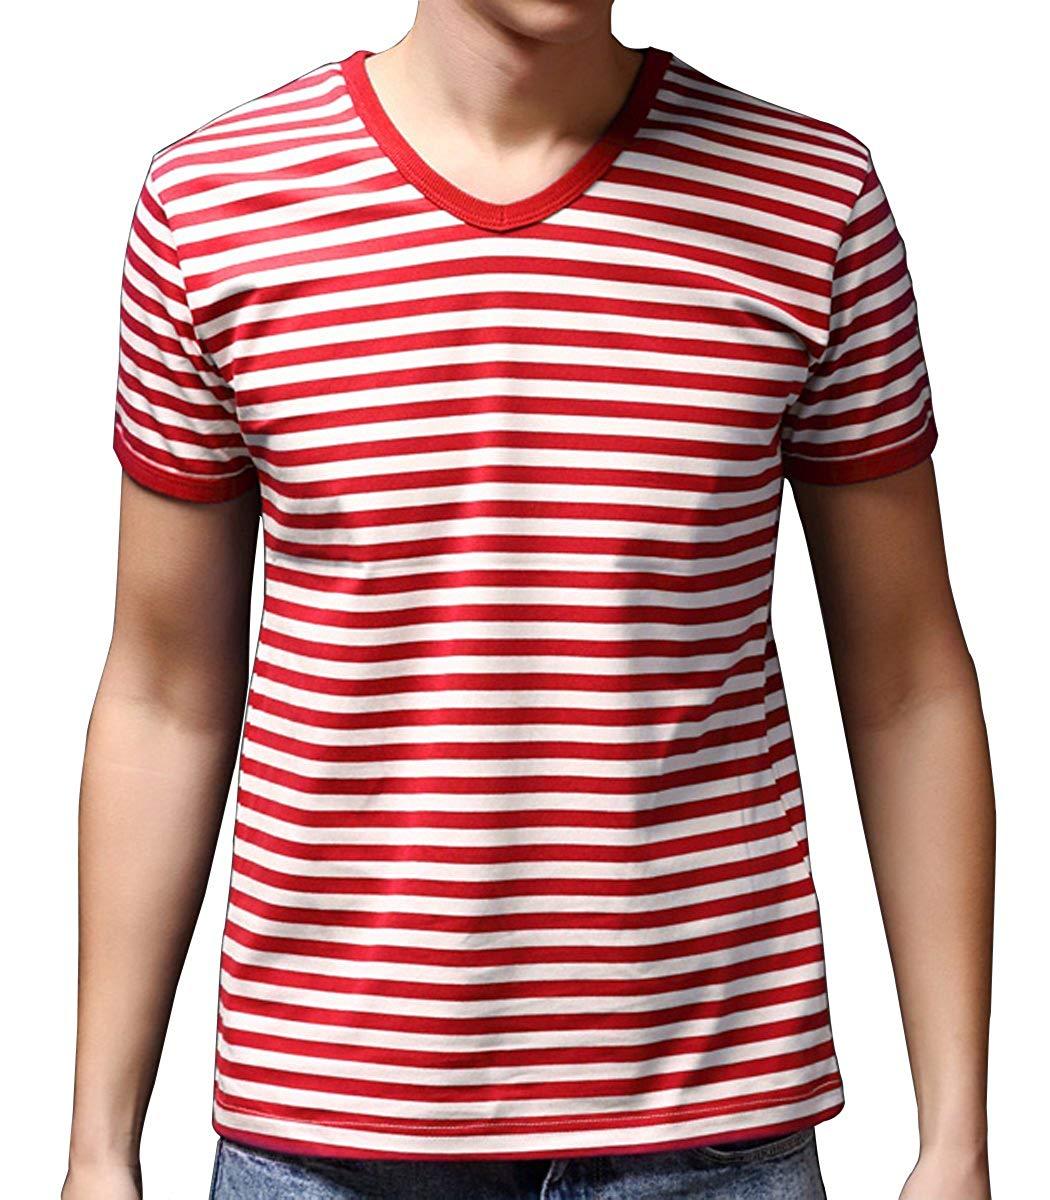 7e992054712a Get Quotations · Ezsskj Men Boy Stripes Tee Tops Crew Neck Black White  Striped T Shirt Outfits